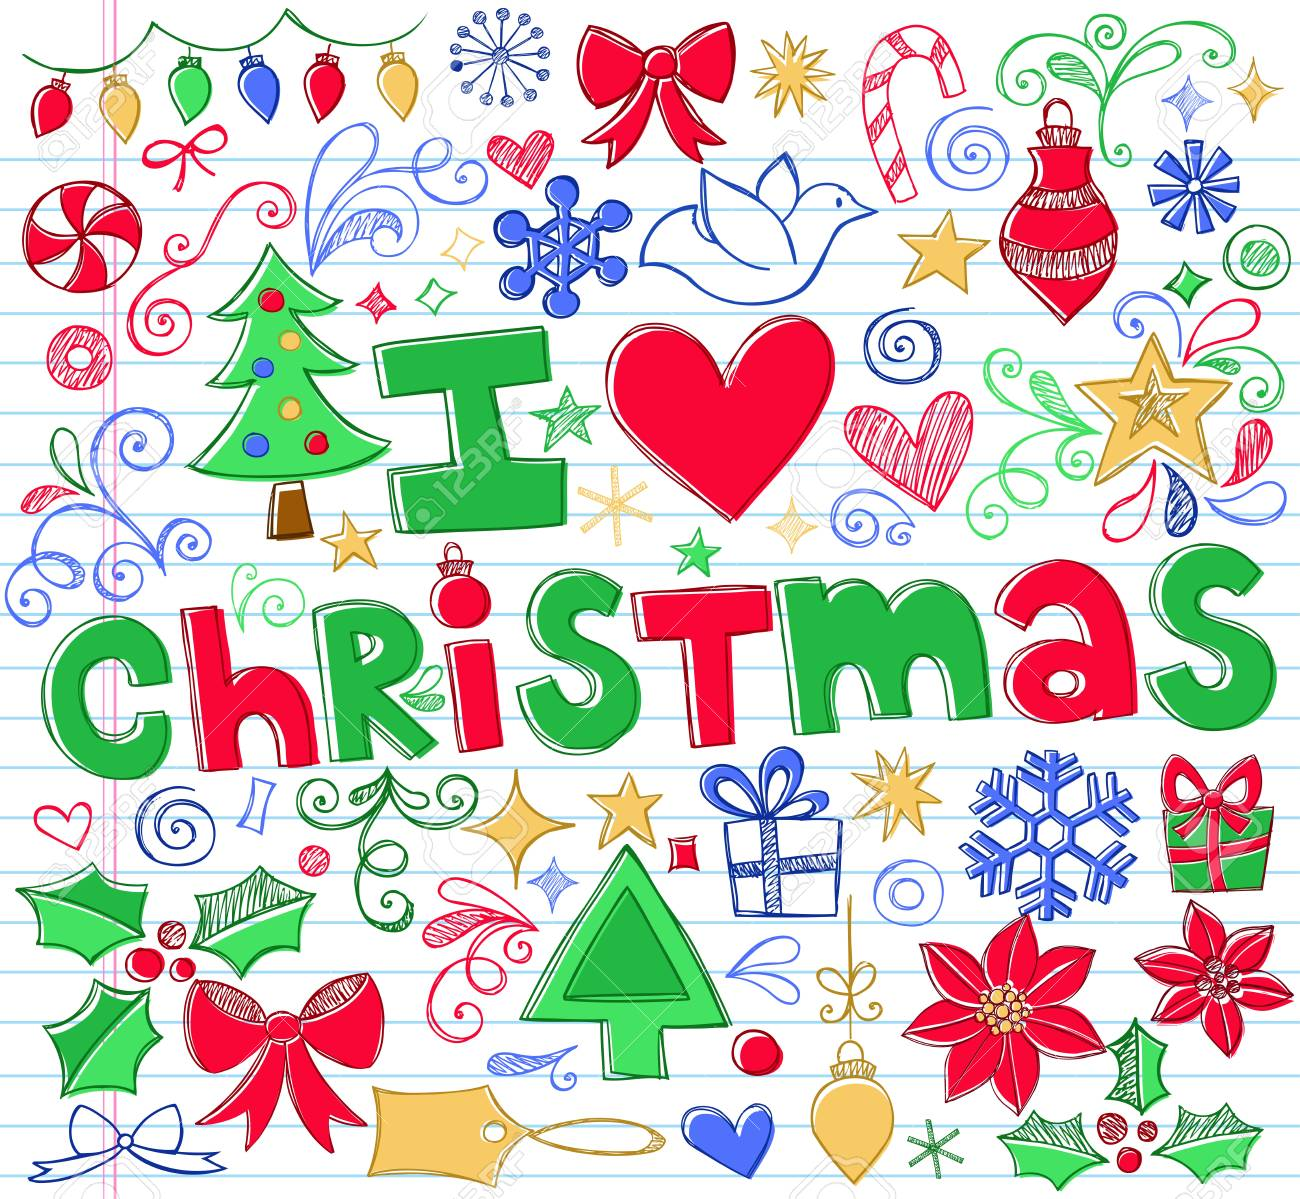 I Love Christmas.Hand Drawn I Love Christmas Sketchy Notebook Doodles Vector